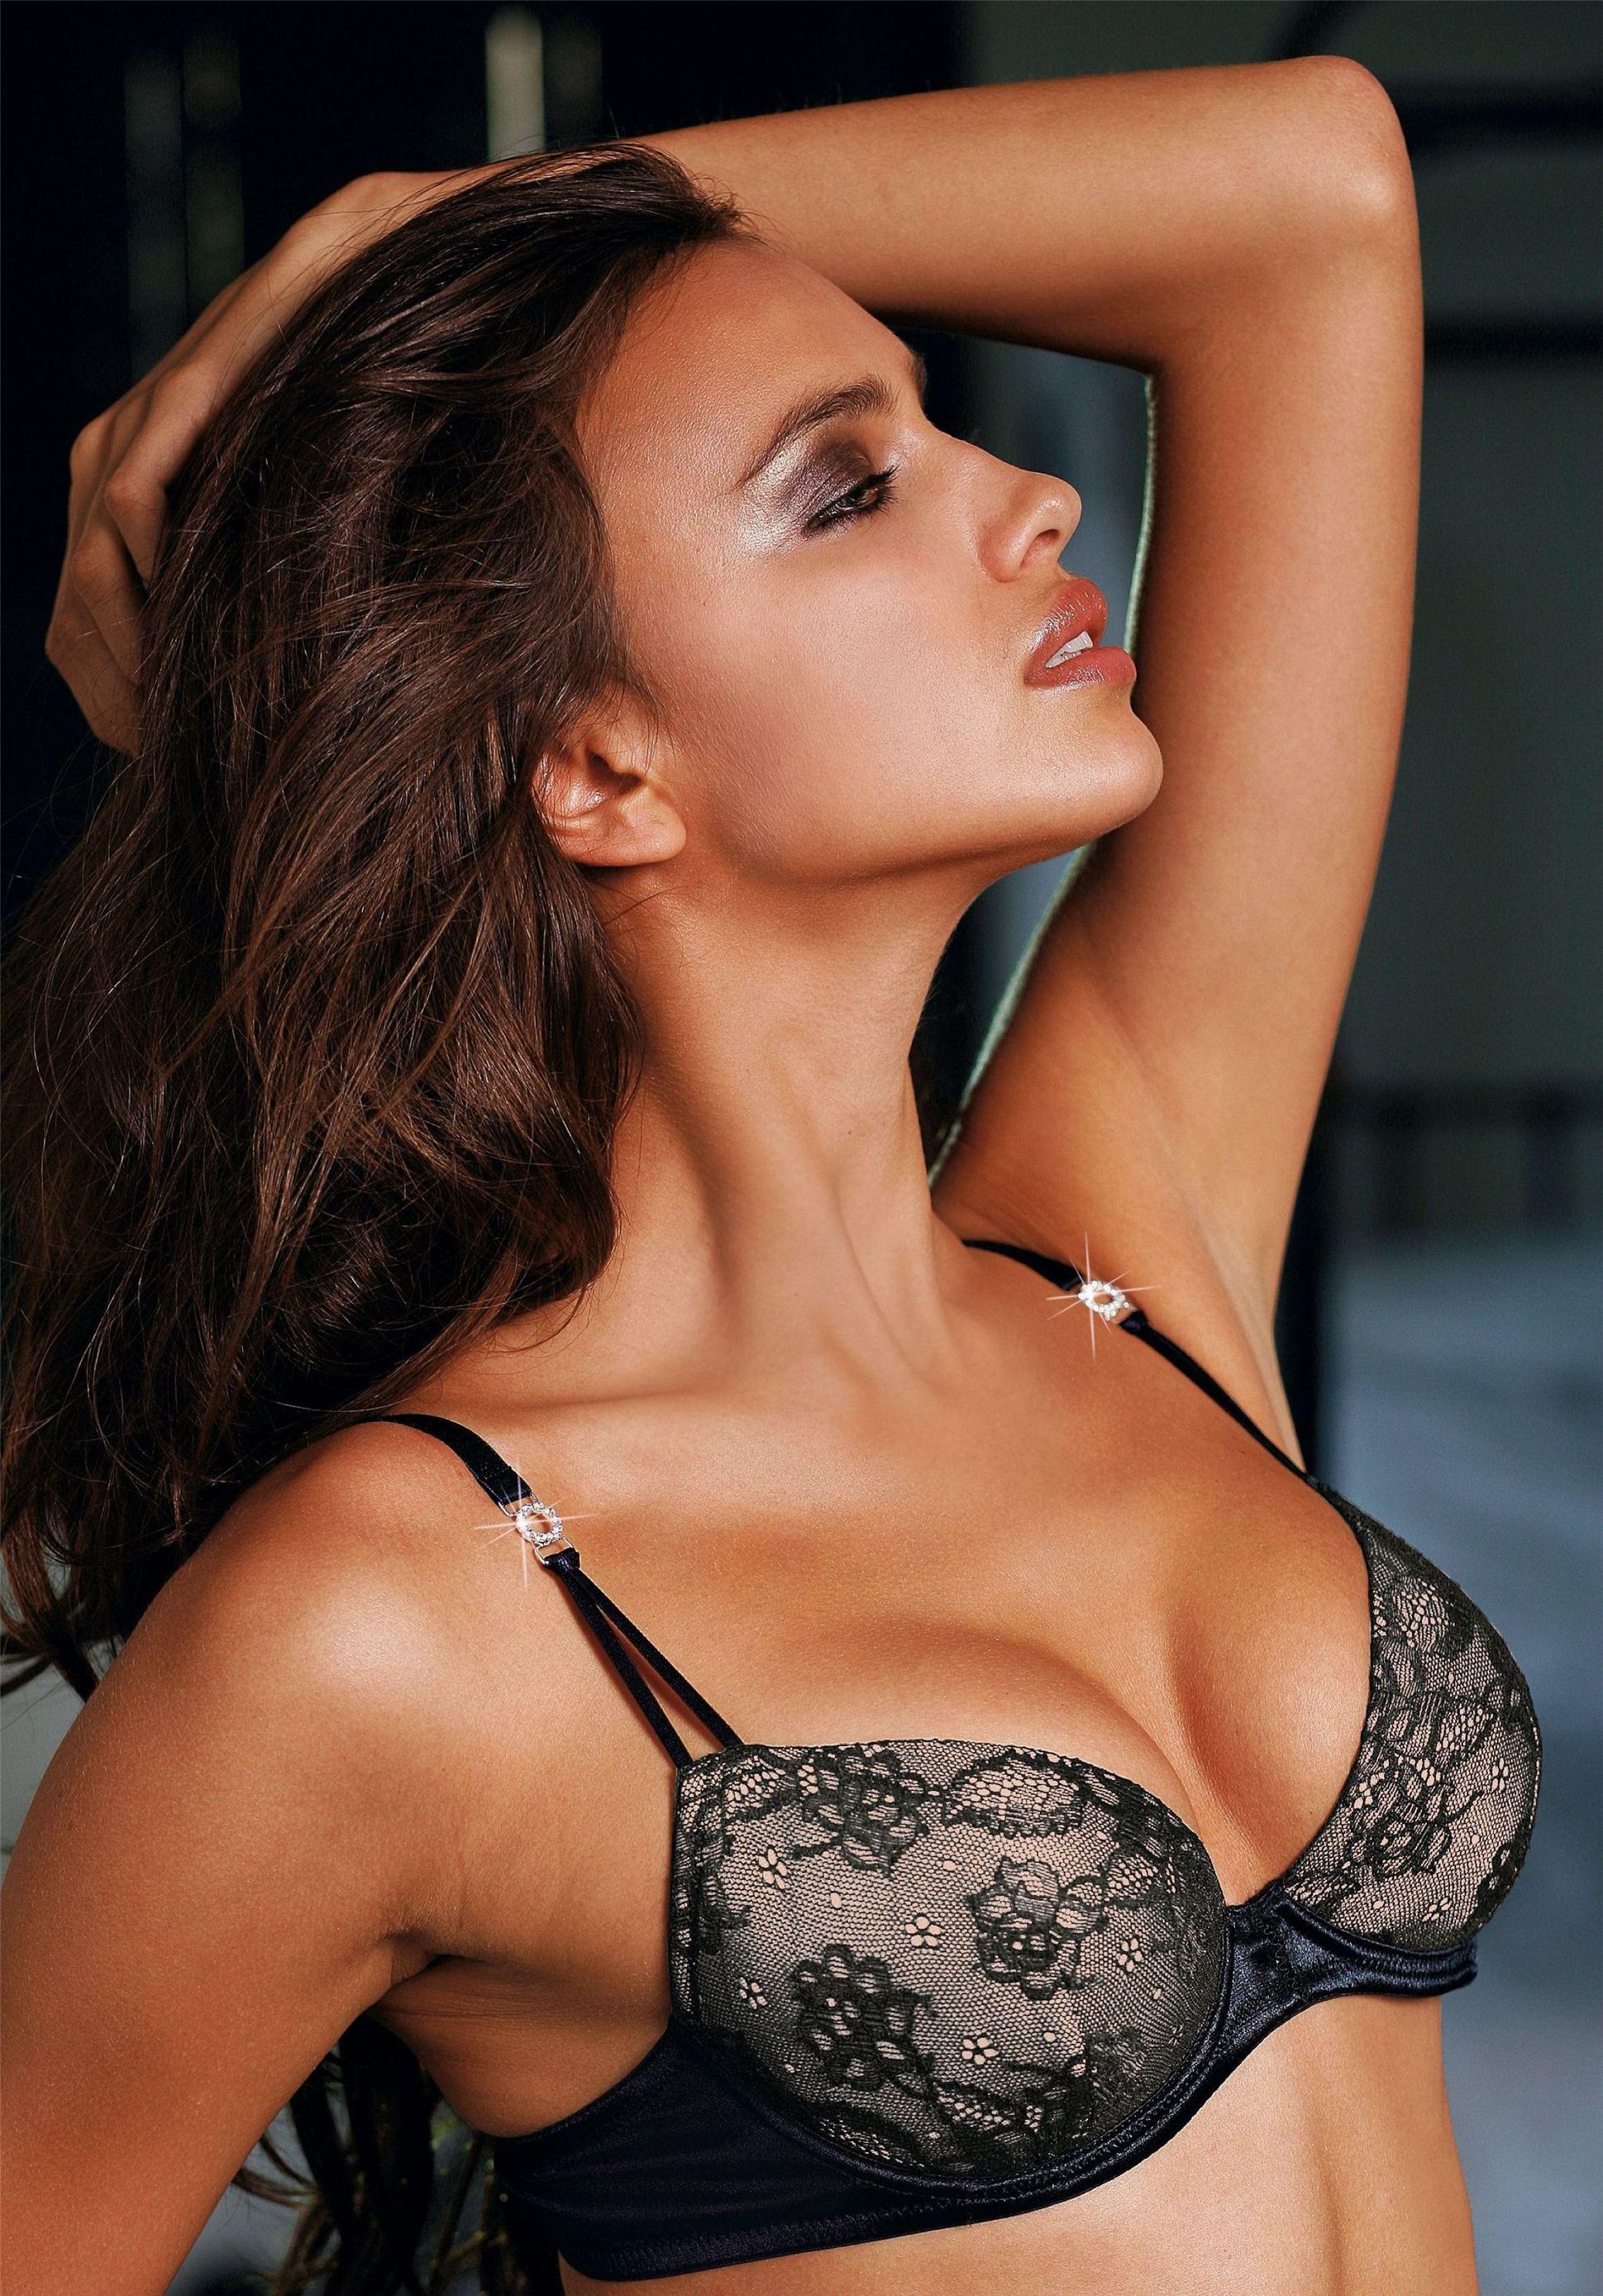 Ирина Шейк в нижнем белье / Irina Shayk / Irina Sheik lingerie hq photoshoot